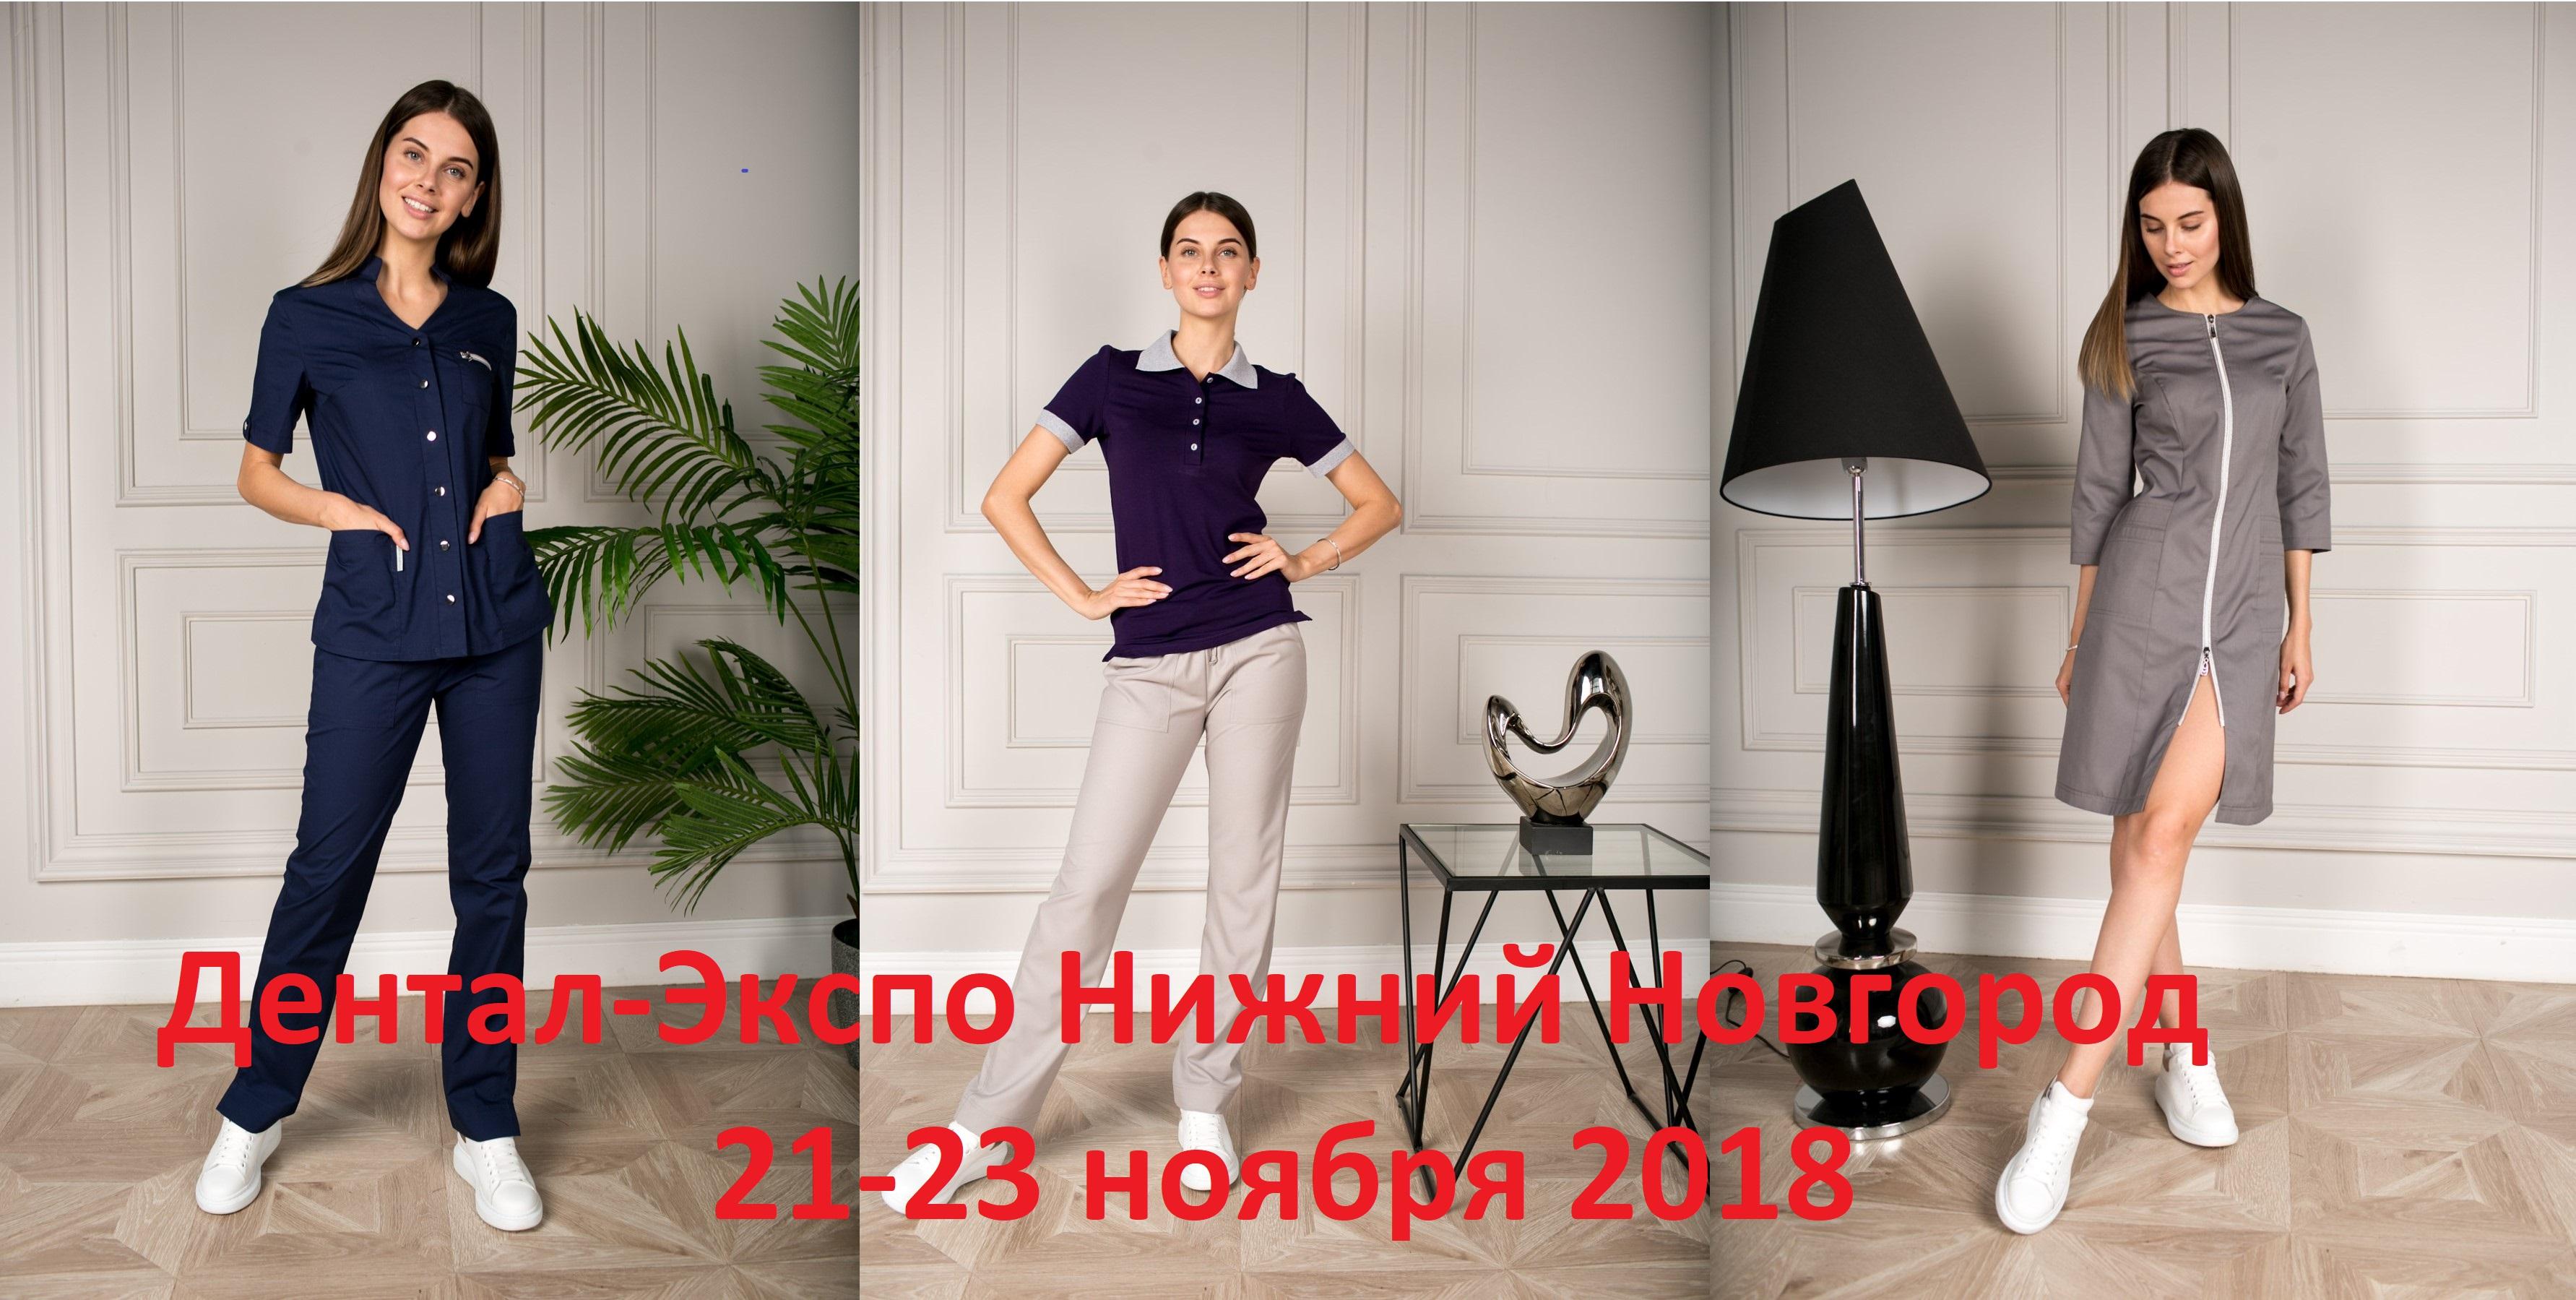 Дентал-Экспо Нижний Новгород